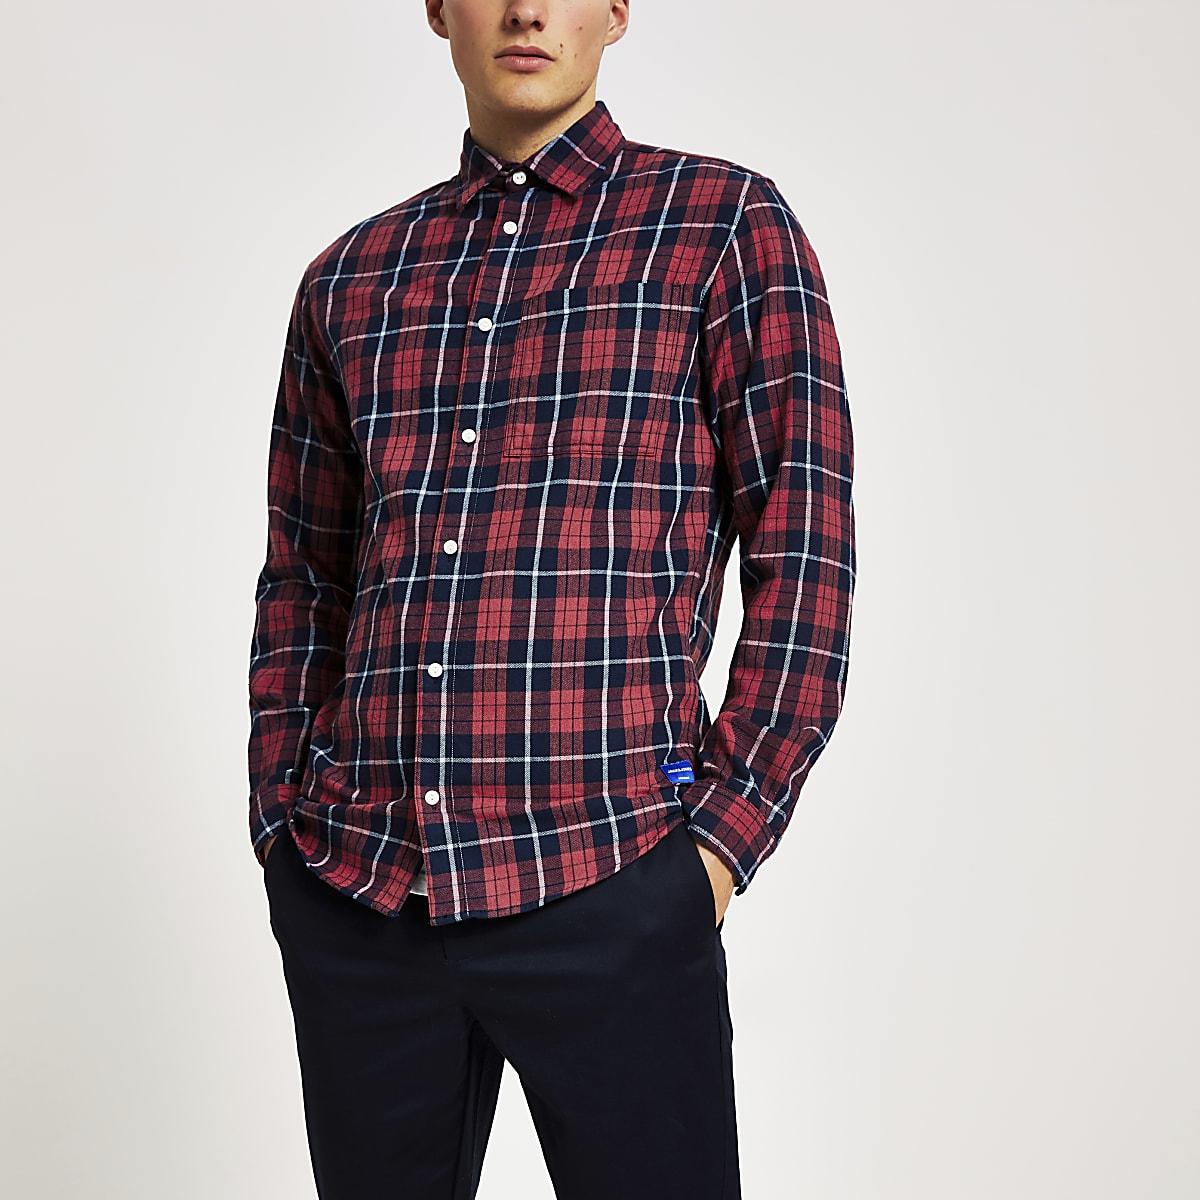 Jack & Jones red check long sleeve shirt